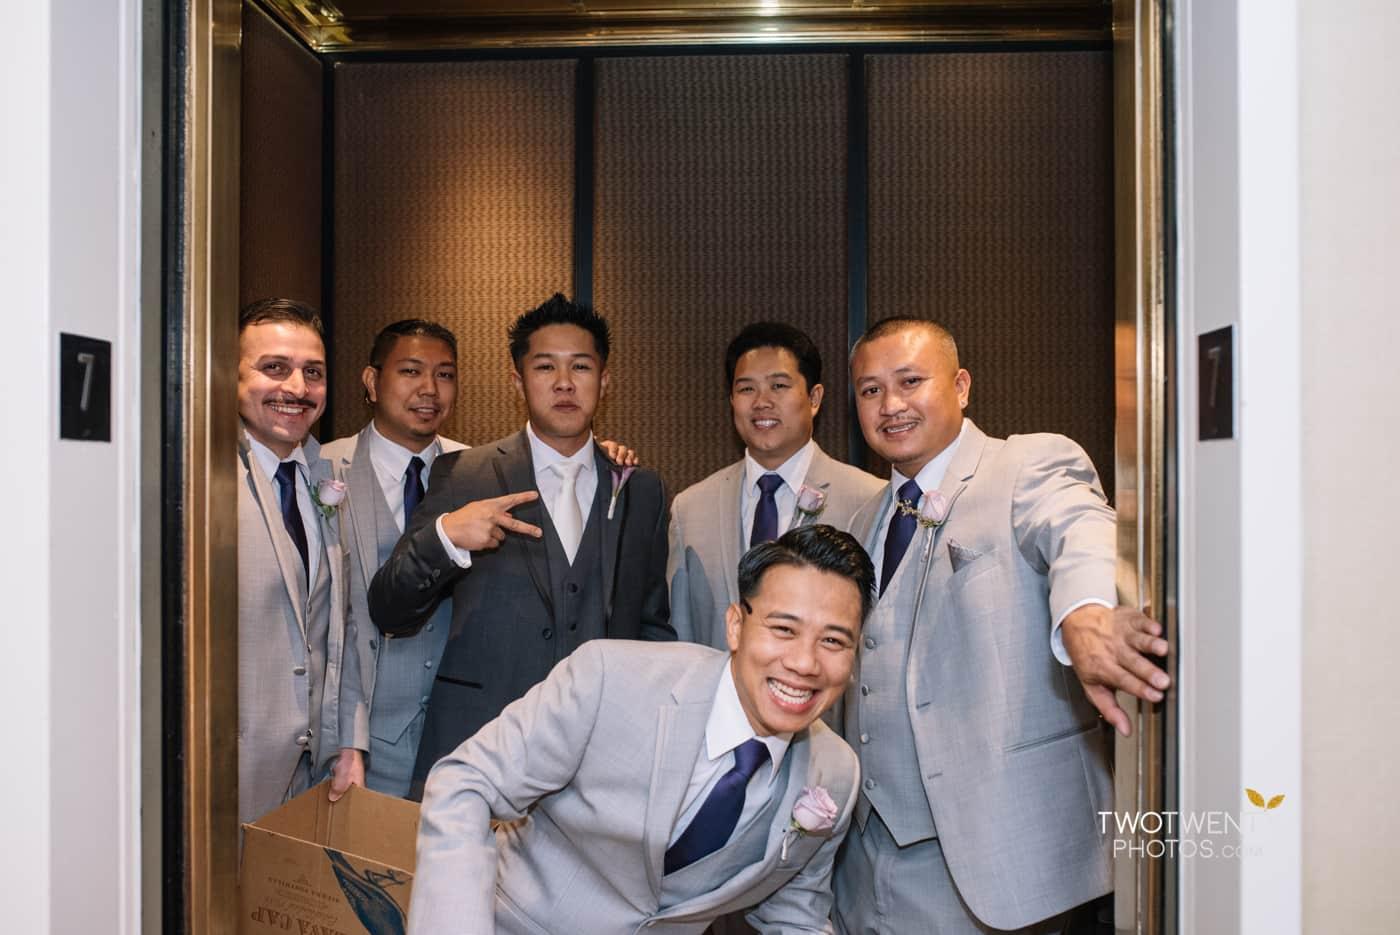 hyatt-regency-downtown-sacramento-wedding-photographer-22